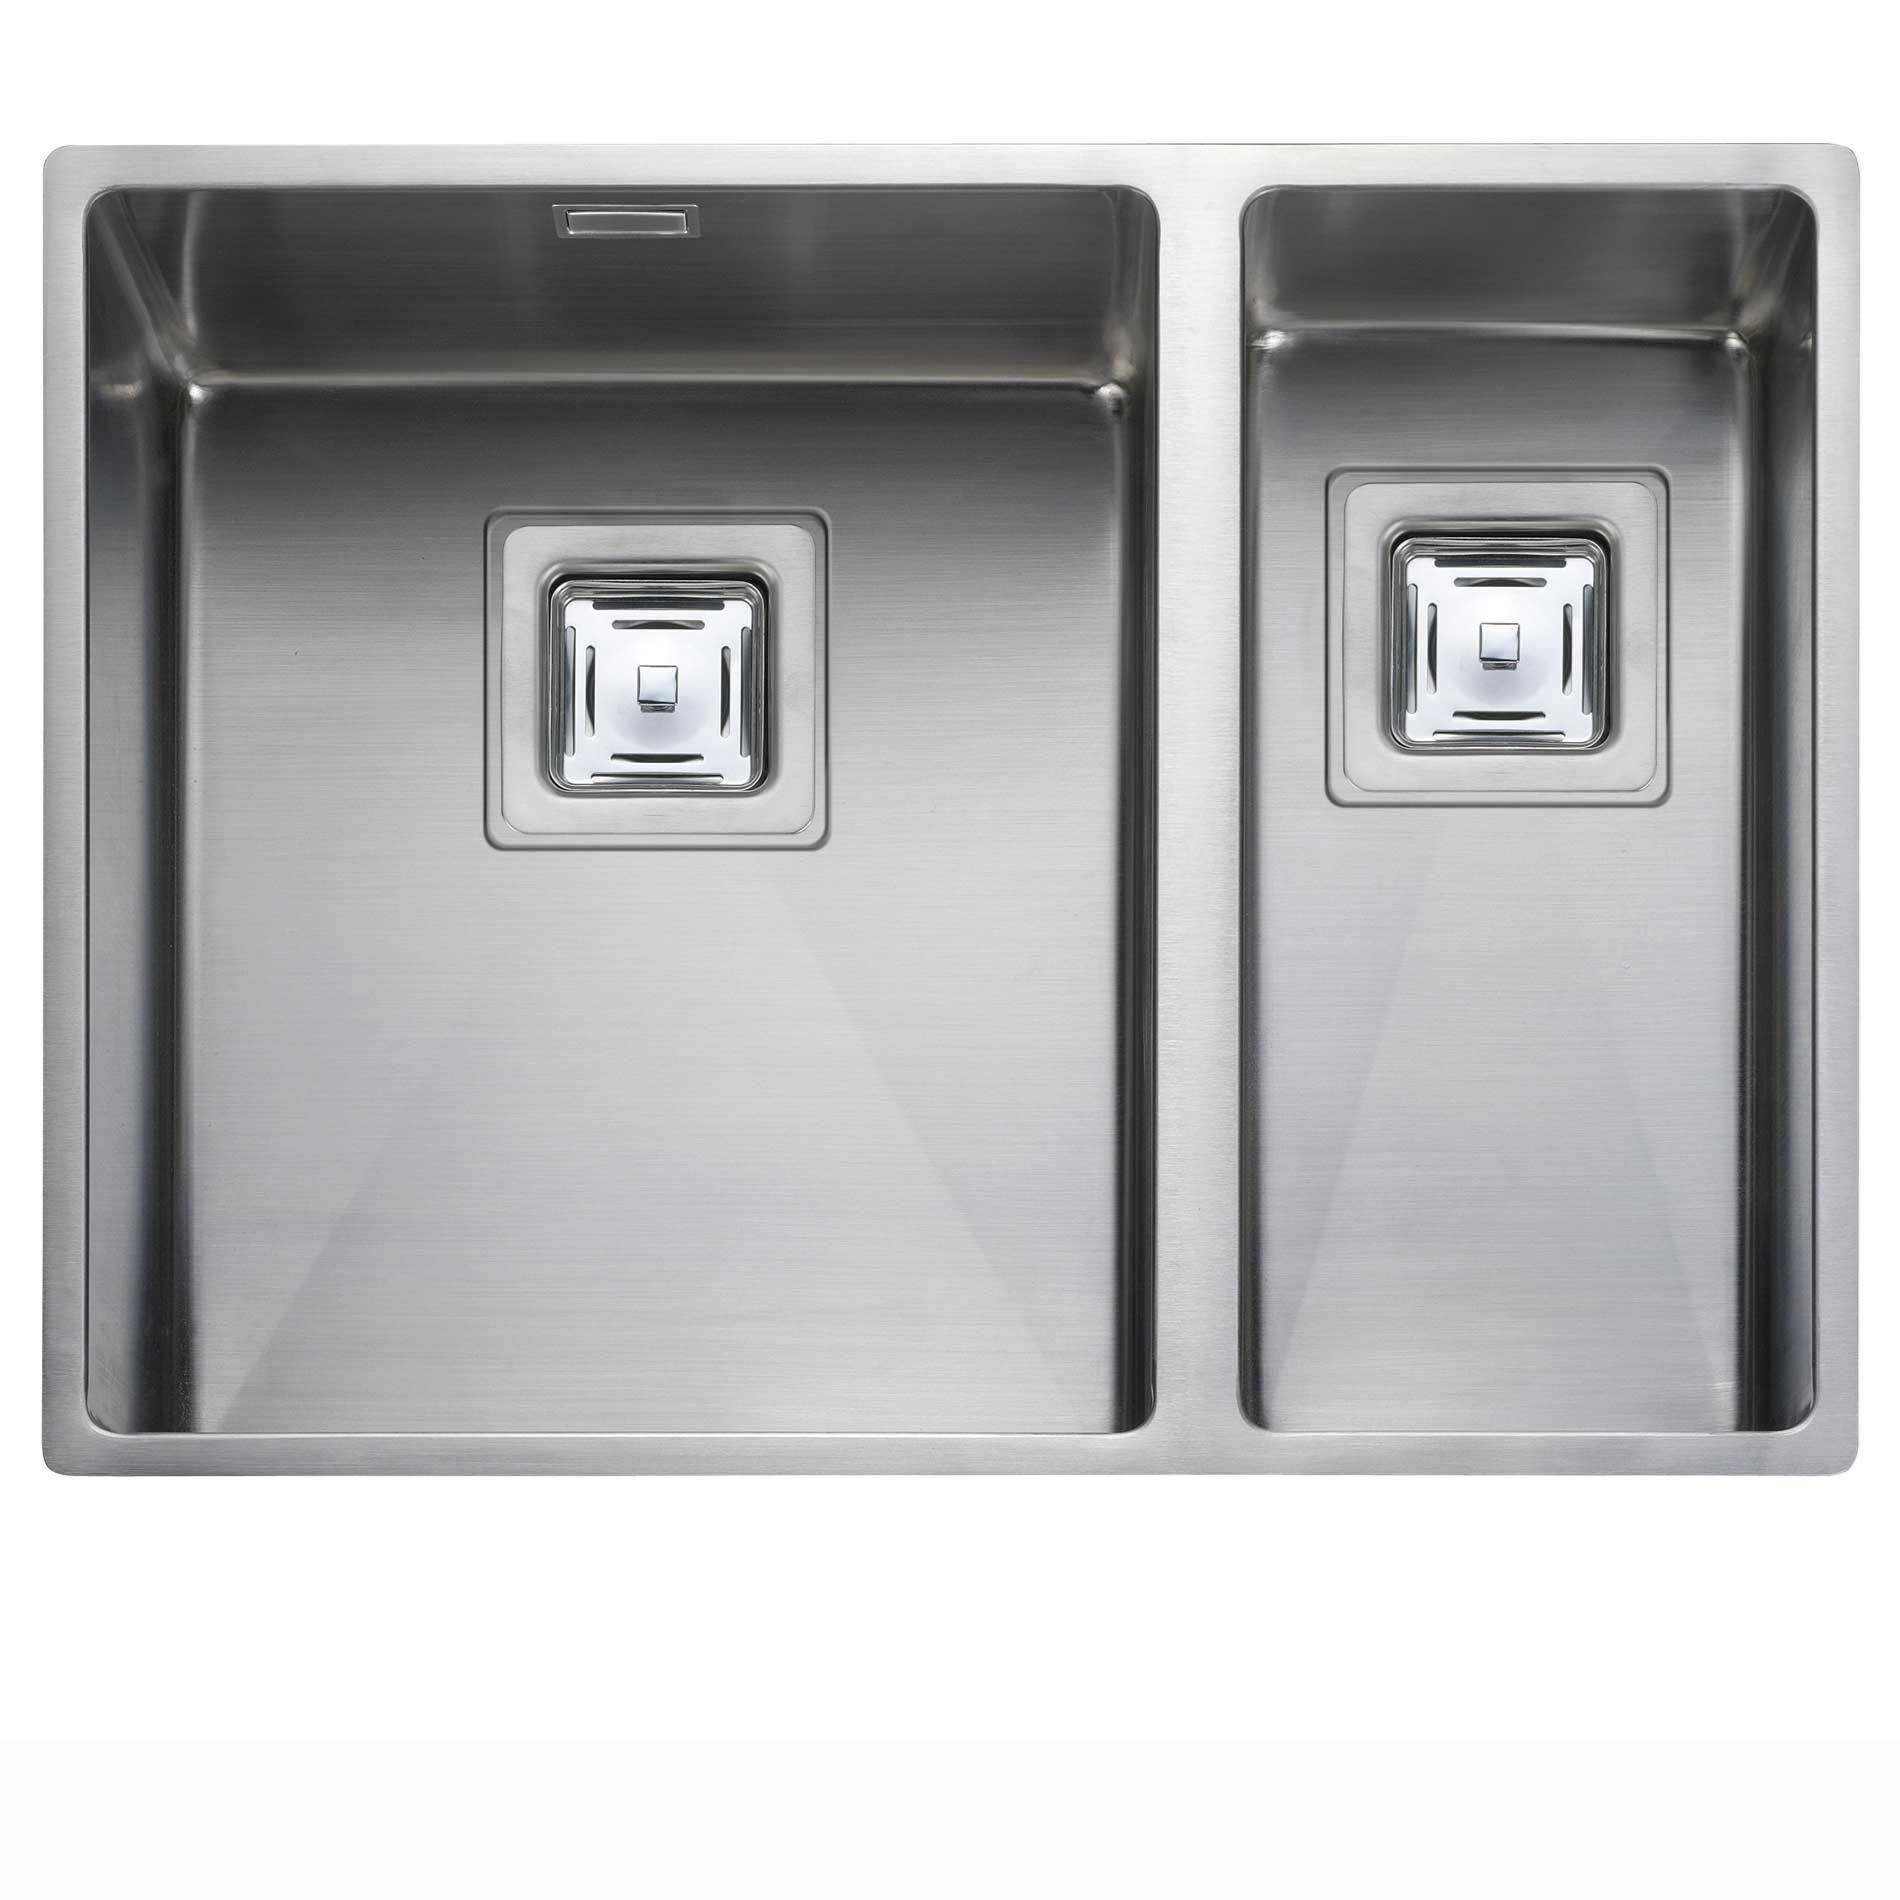 Picture Of Atlantic Kube KUB3418 Stainless Steel Sink